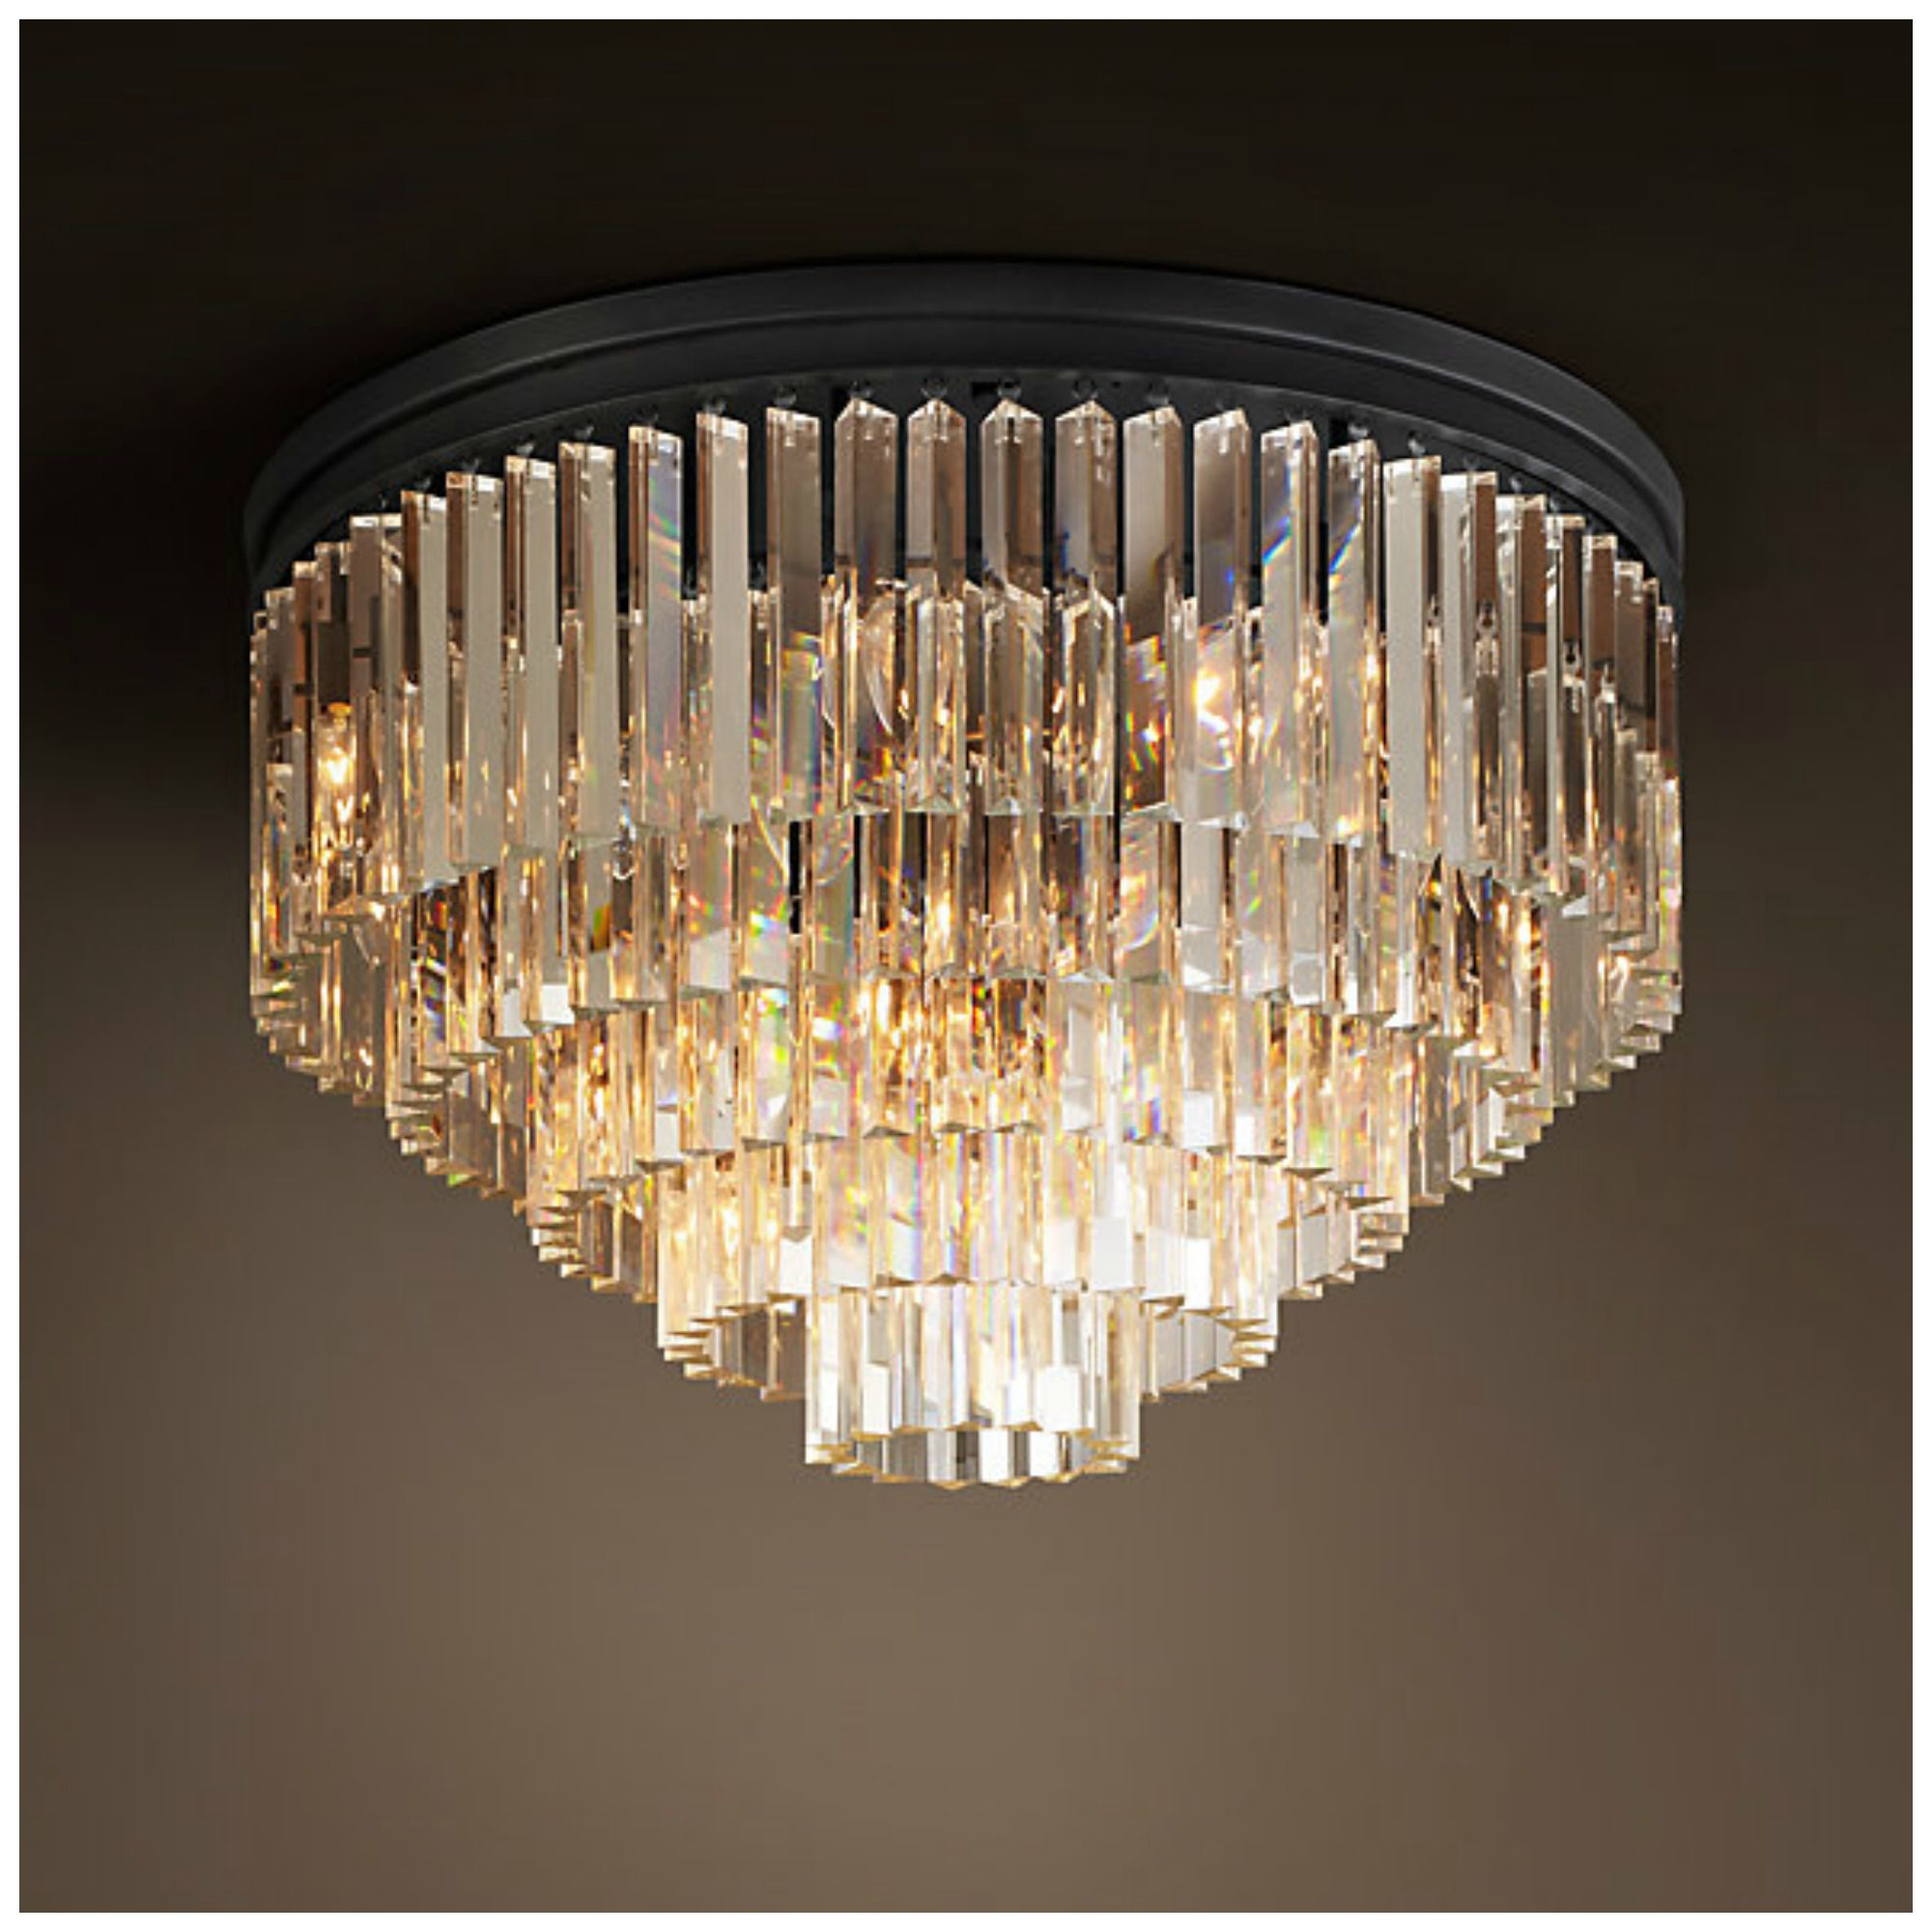 The Best Flush Mount Ceiling Lights